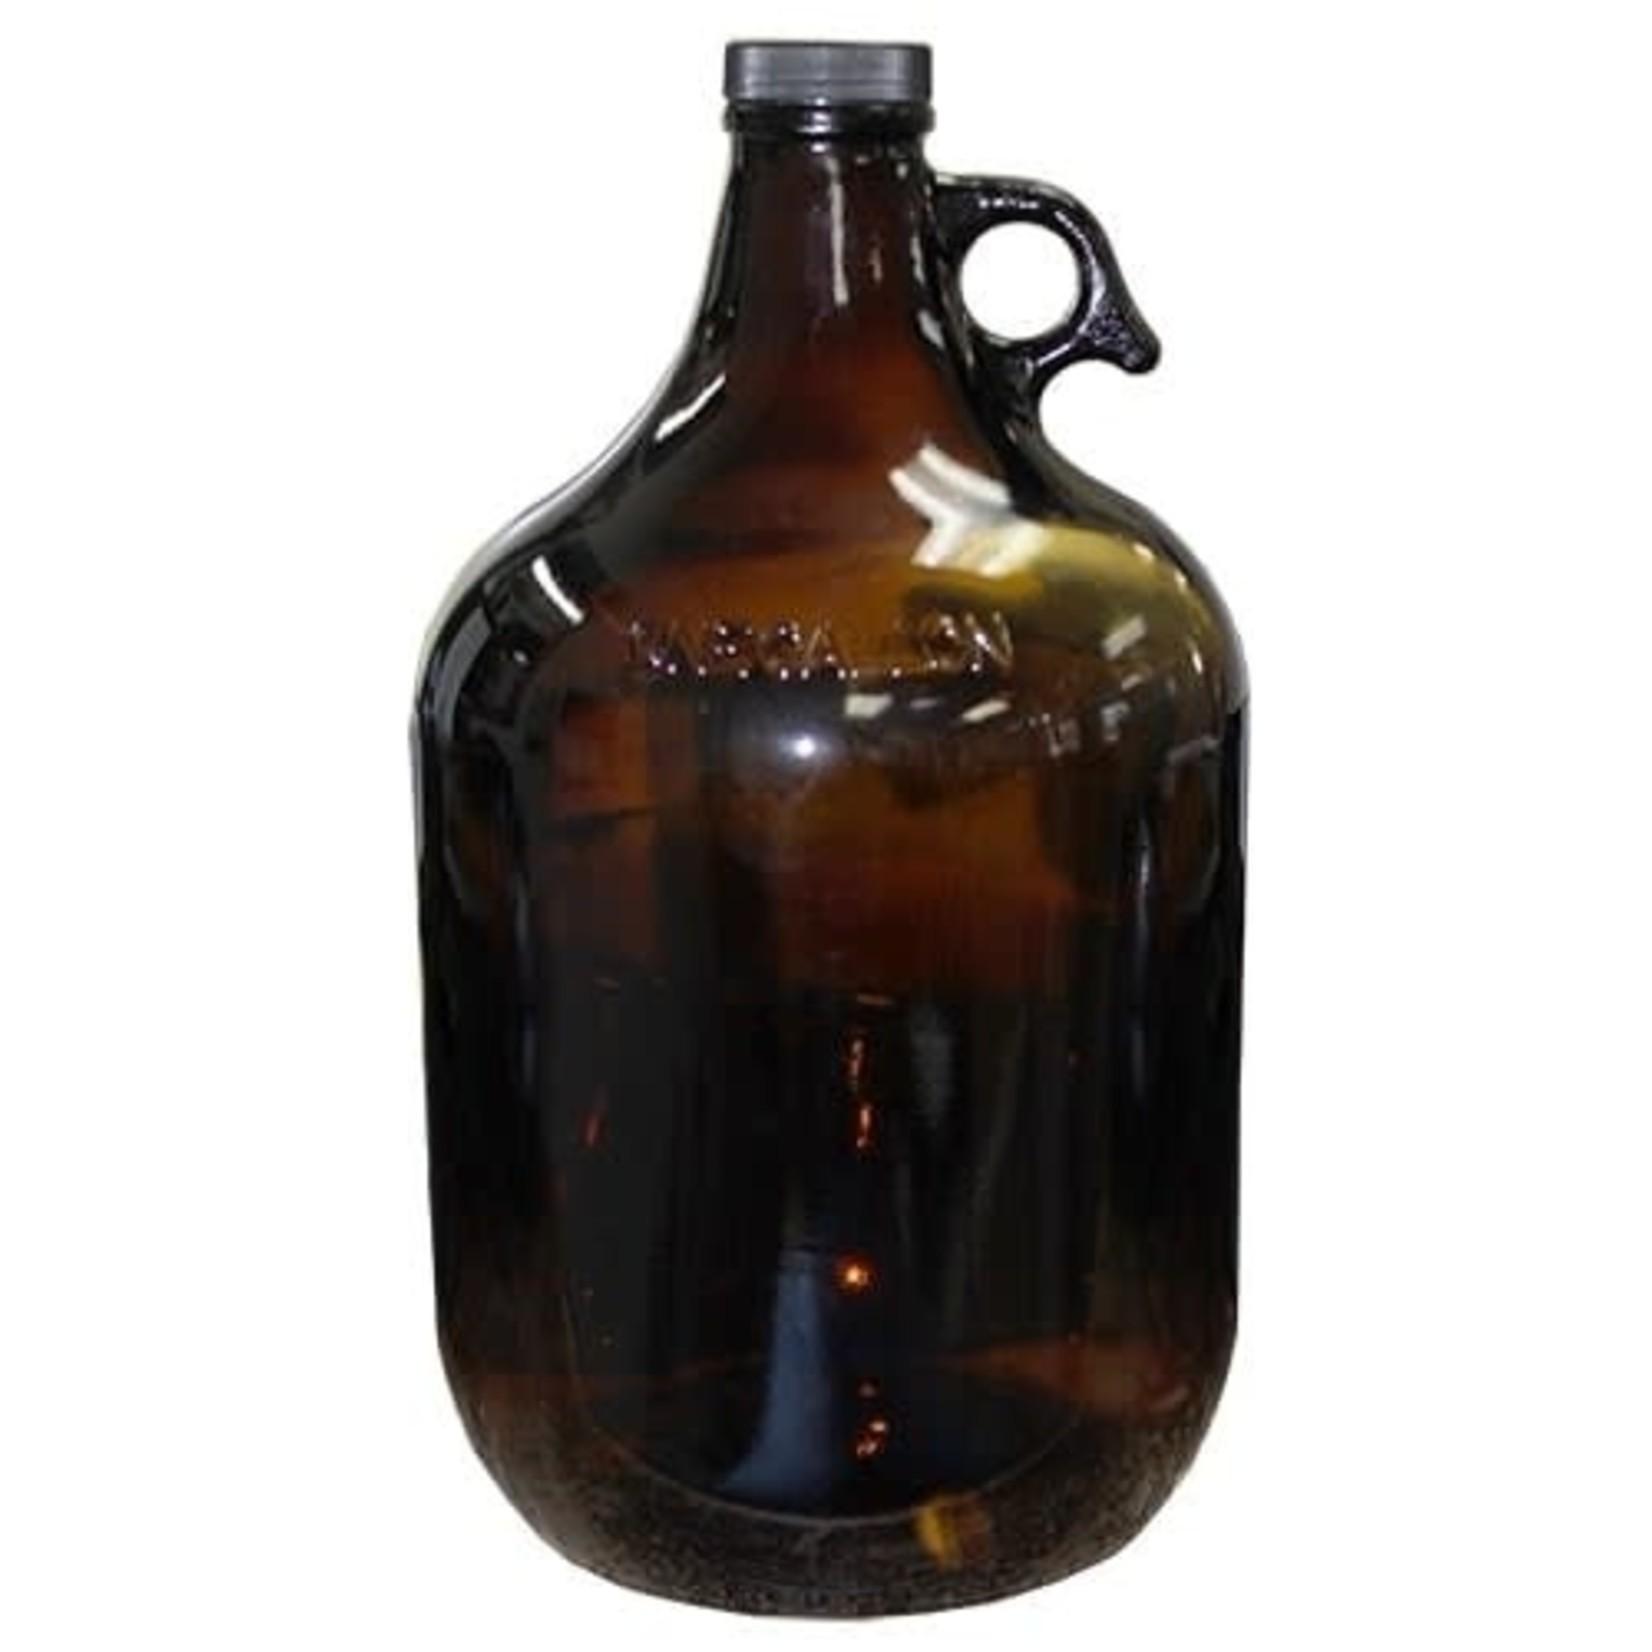 Amber Glass Jug 128oz / 1 Gallon